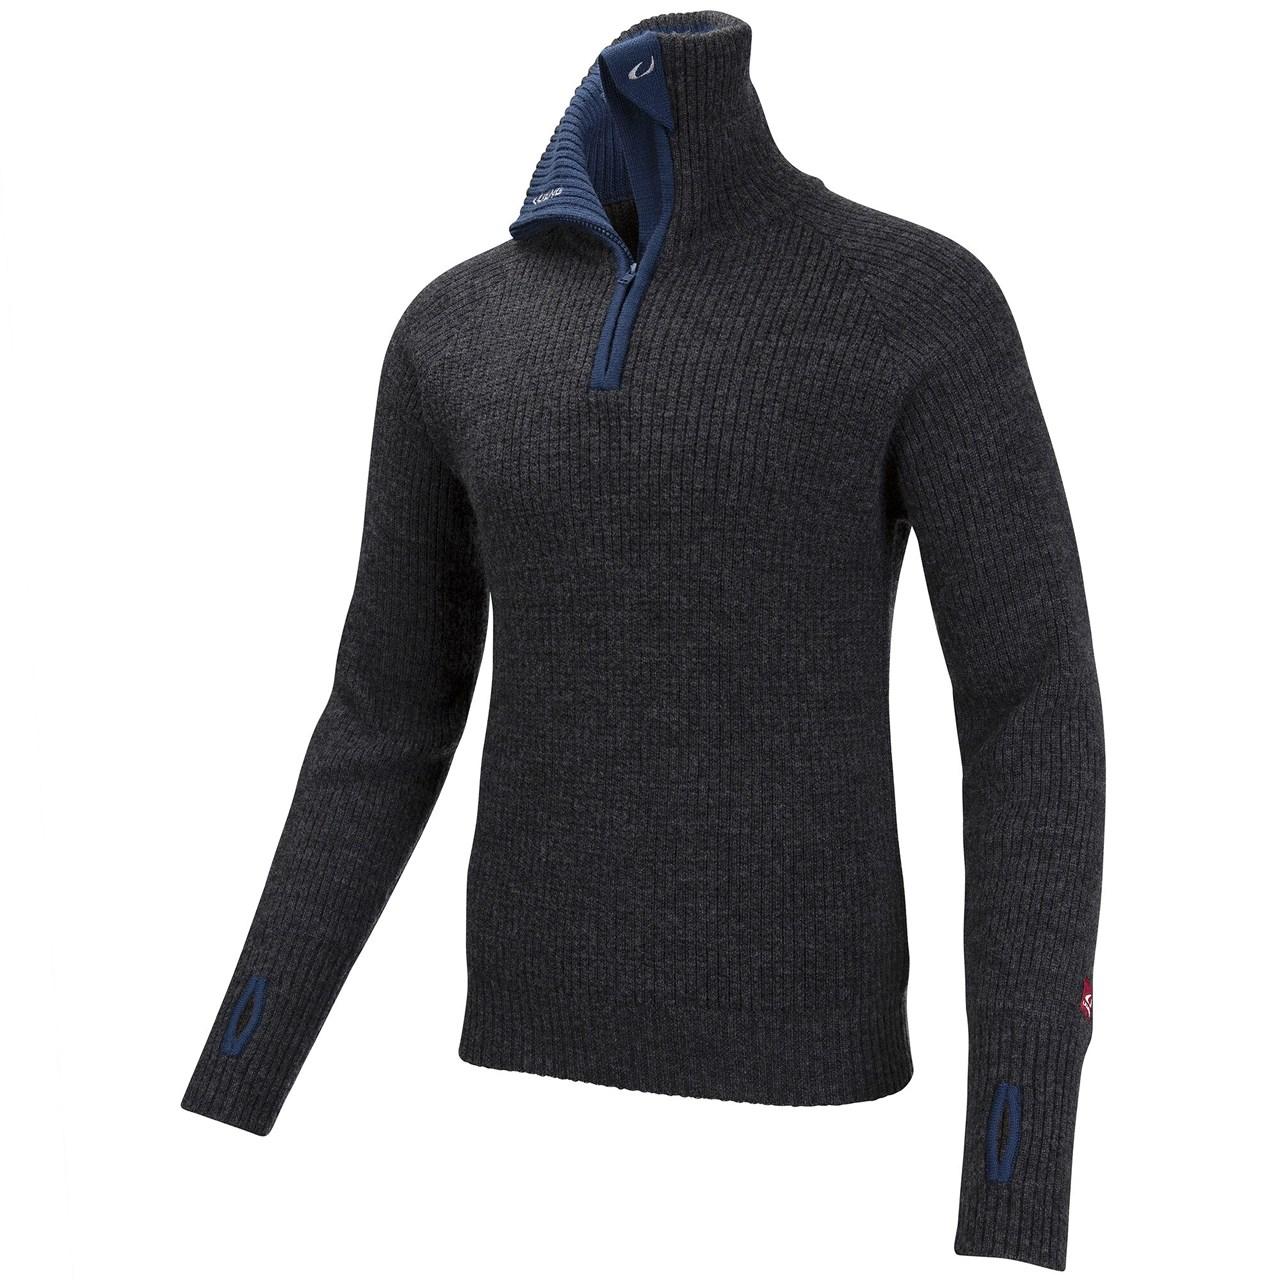 Ulvang Rav sweater w/zip Charcoal Melange/Mid Blue